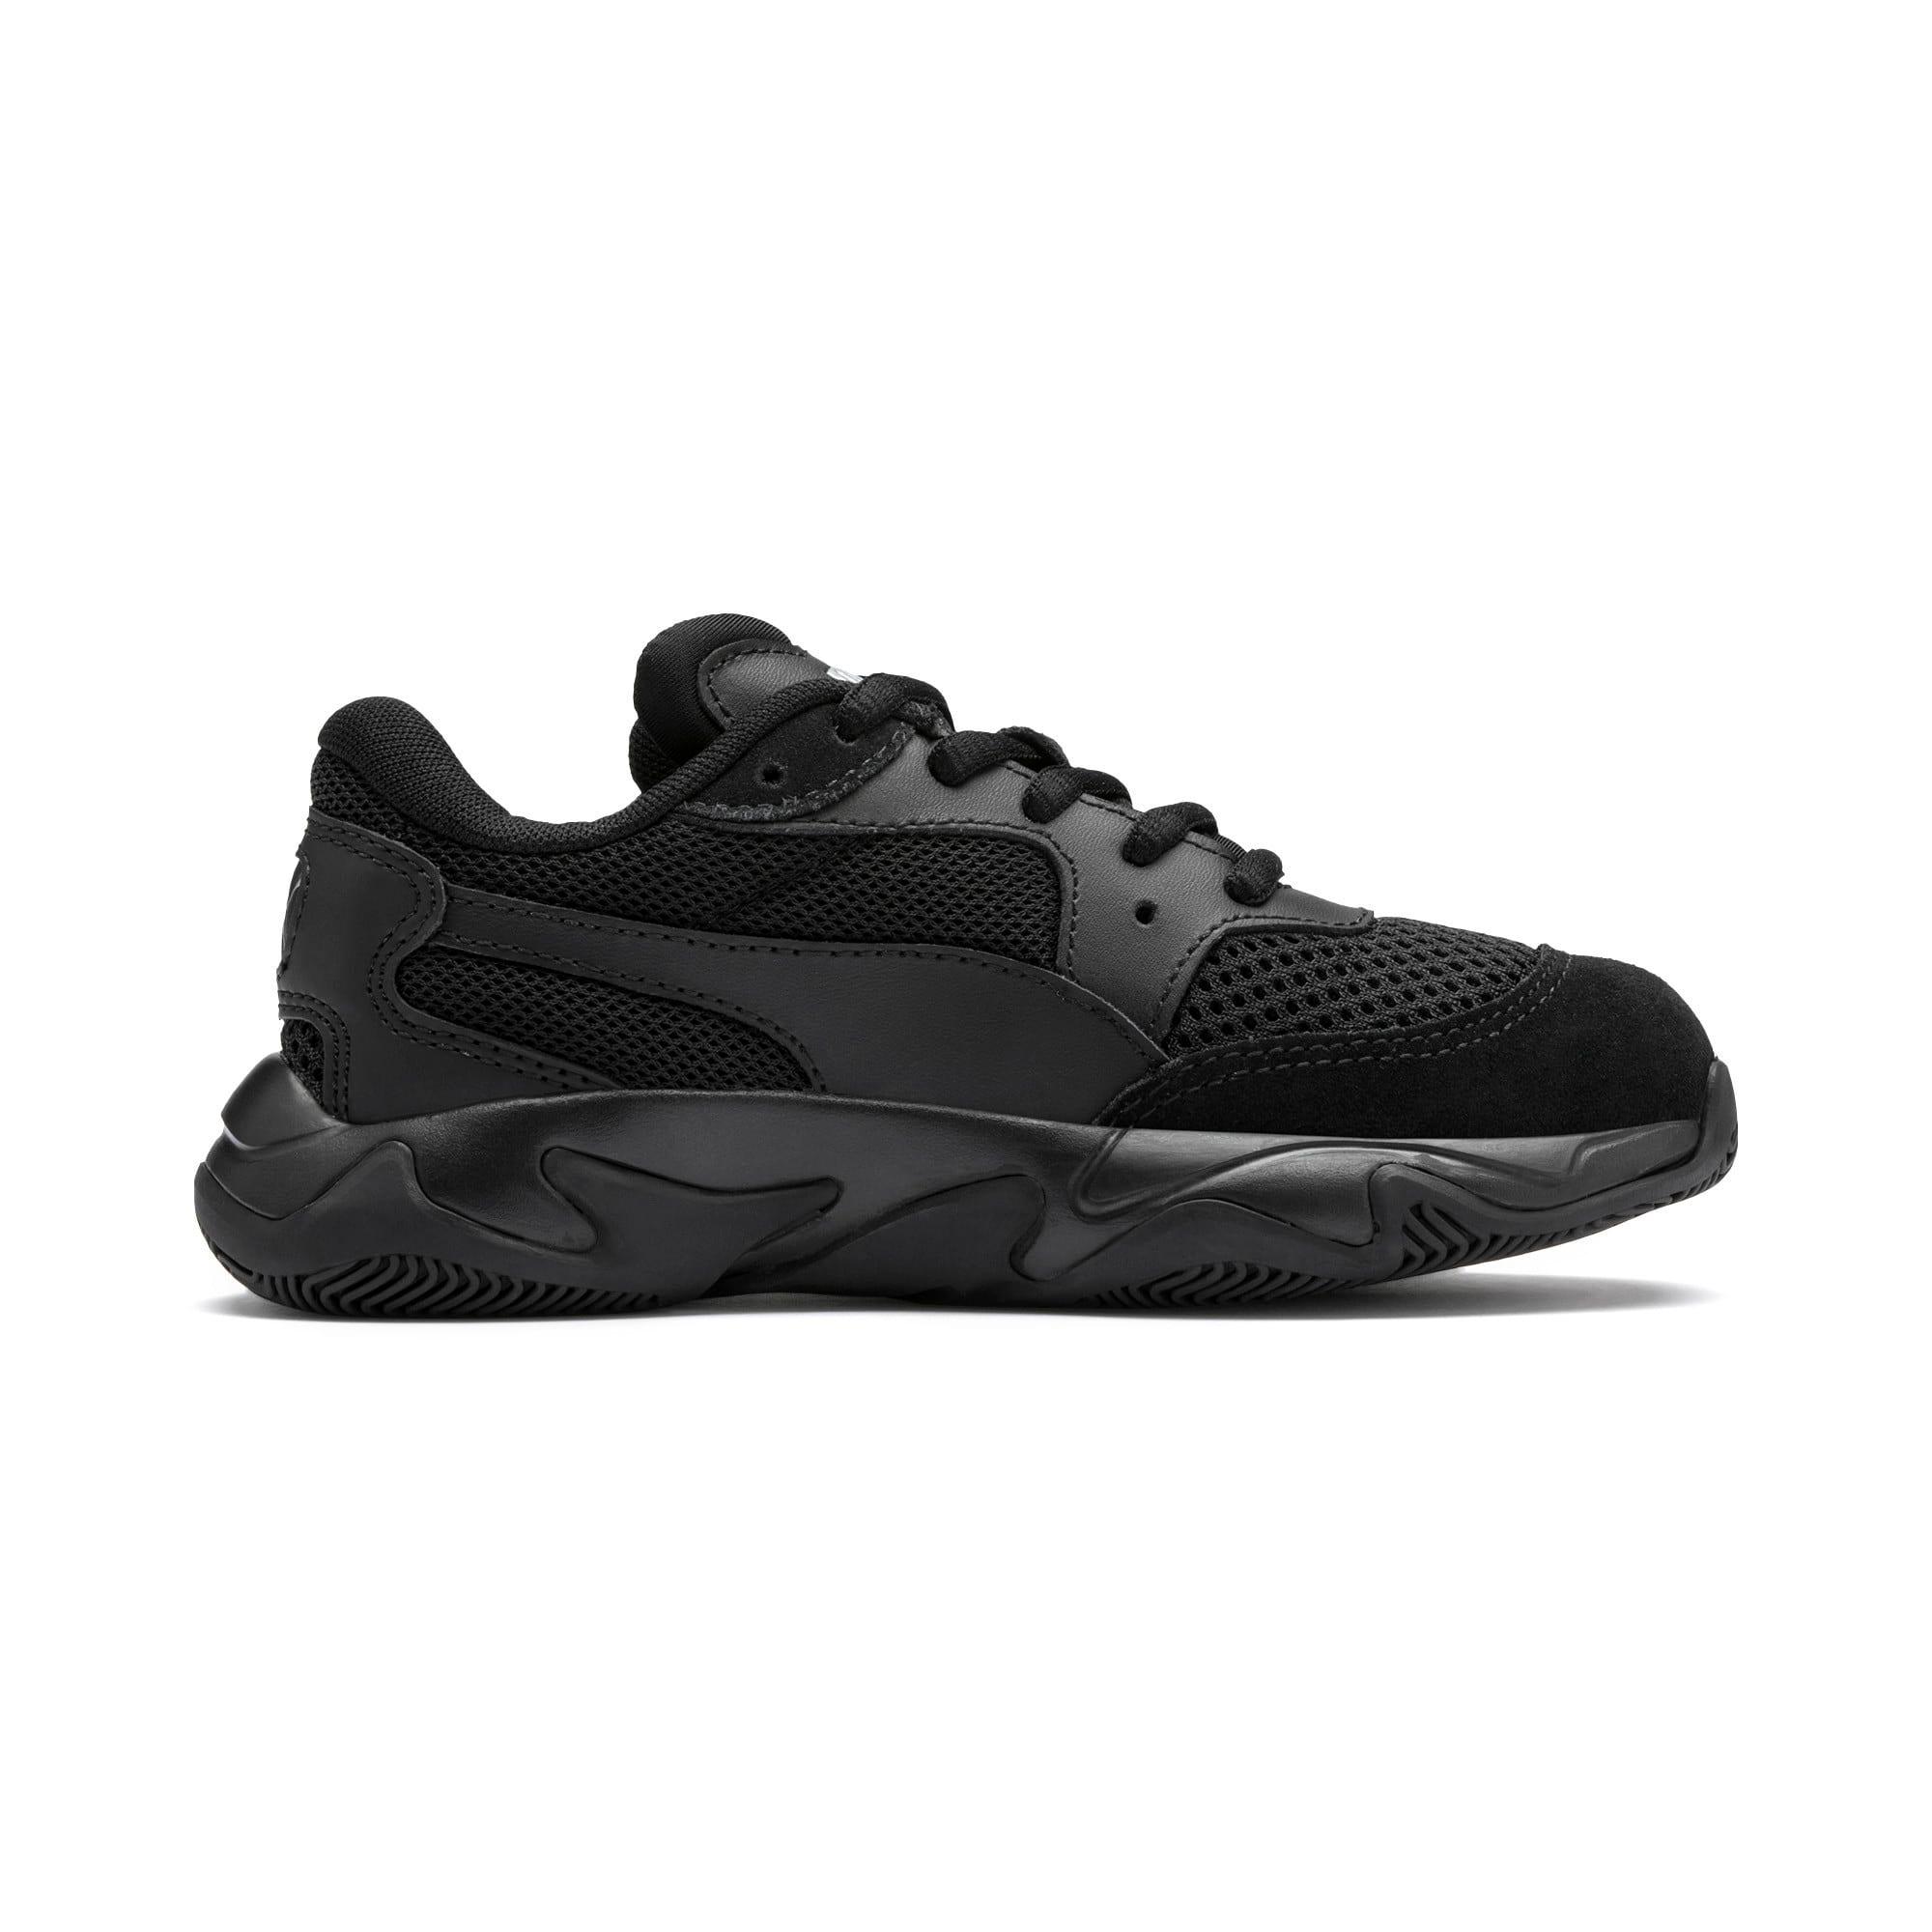 Thumbnail 5 of Storm Origin Little Kids' Shoes, Puma Black, medium